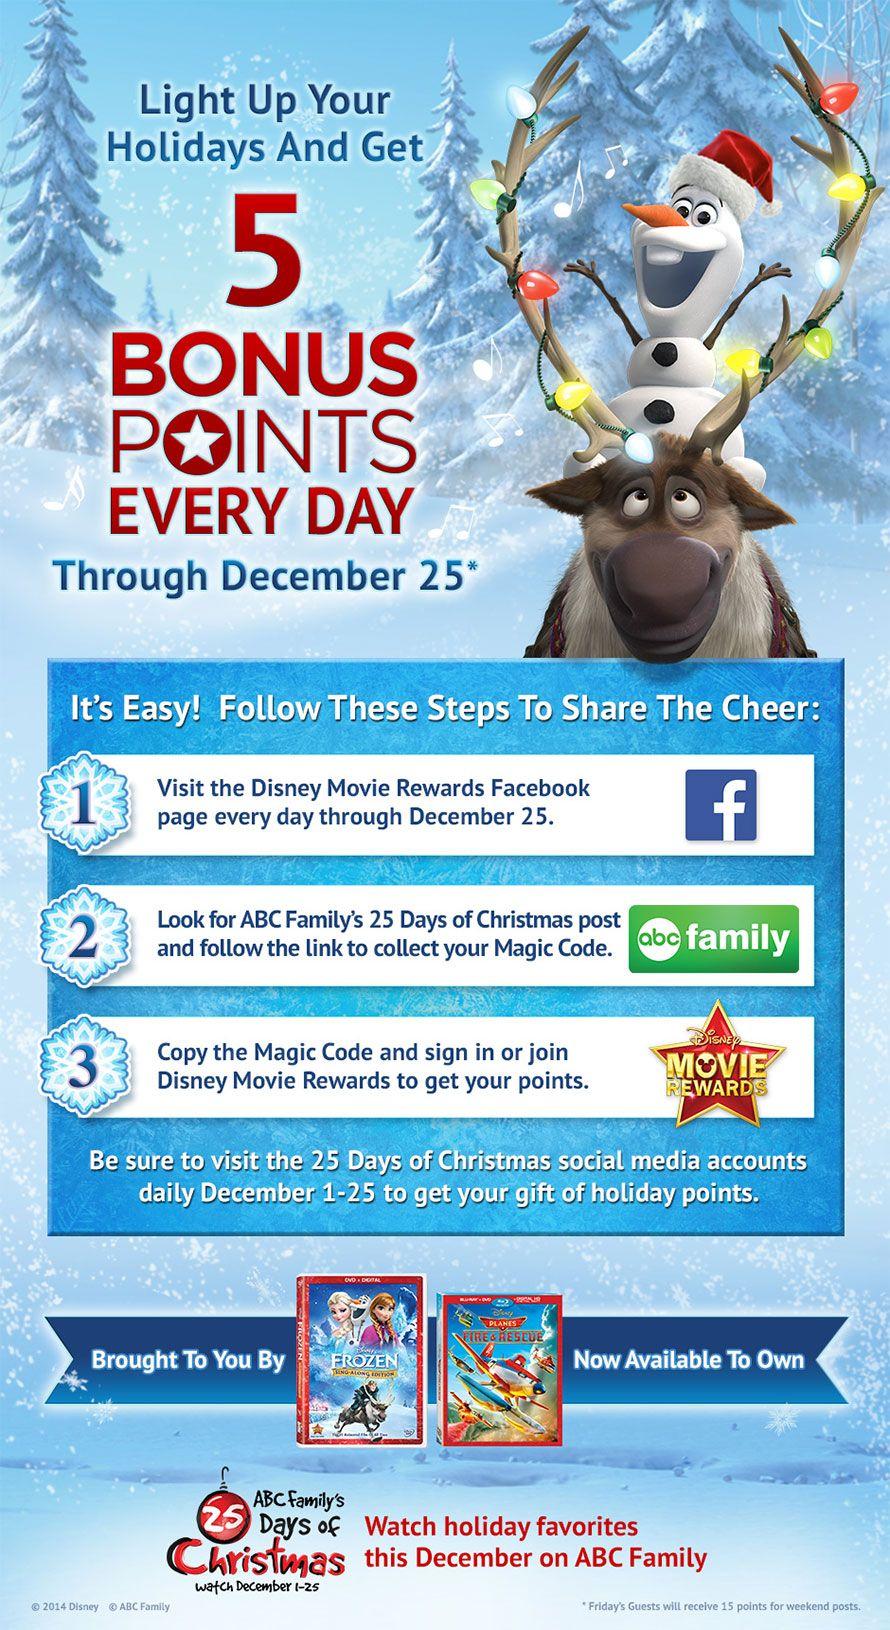 Detailspage8901417646651739 Jpg 25 Days Of Christmas Disney Rewards